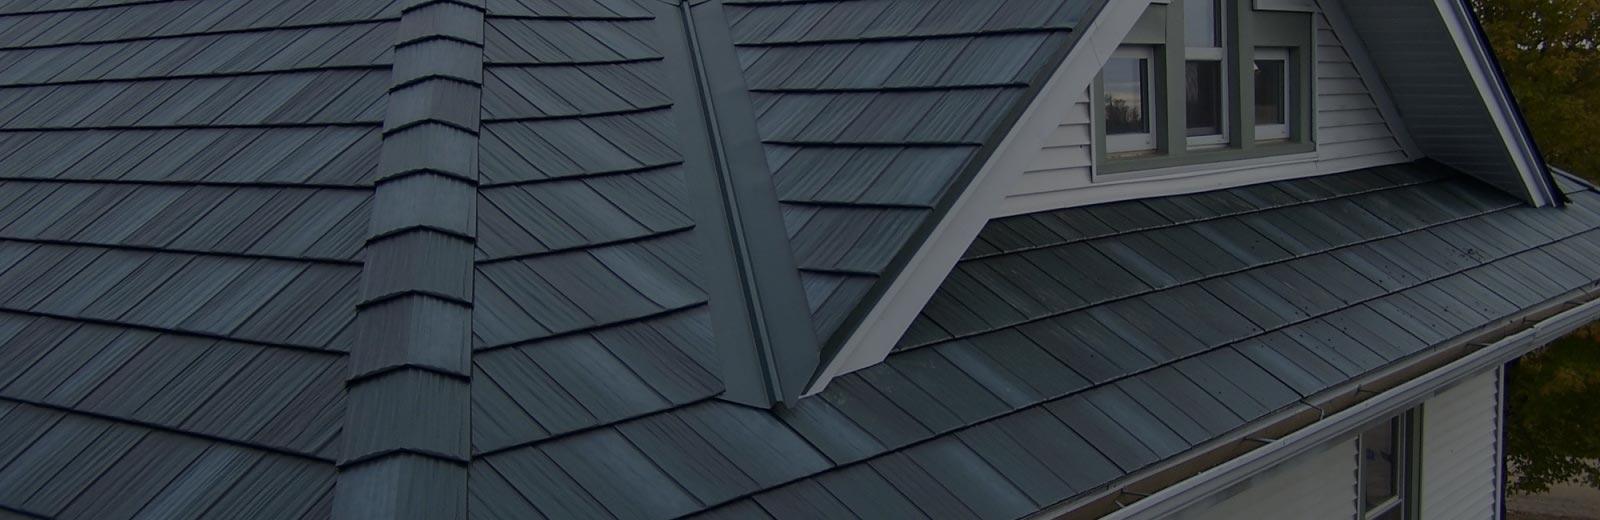 Metal Roofing Birmingham Al Tkf Roofing Birmingham A